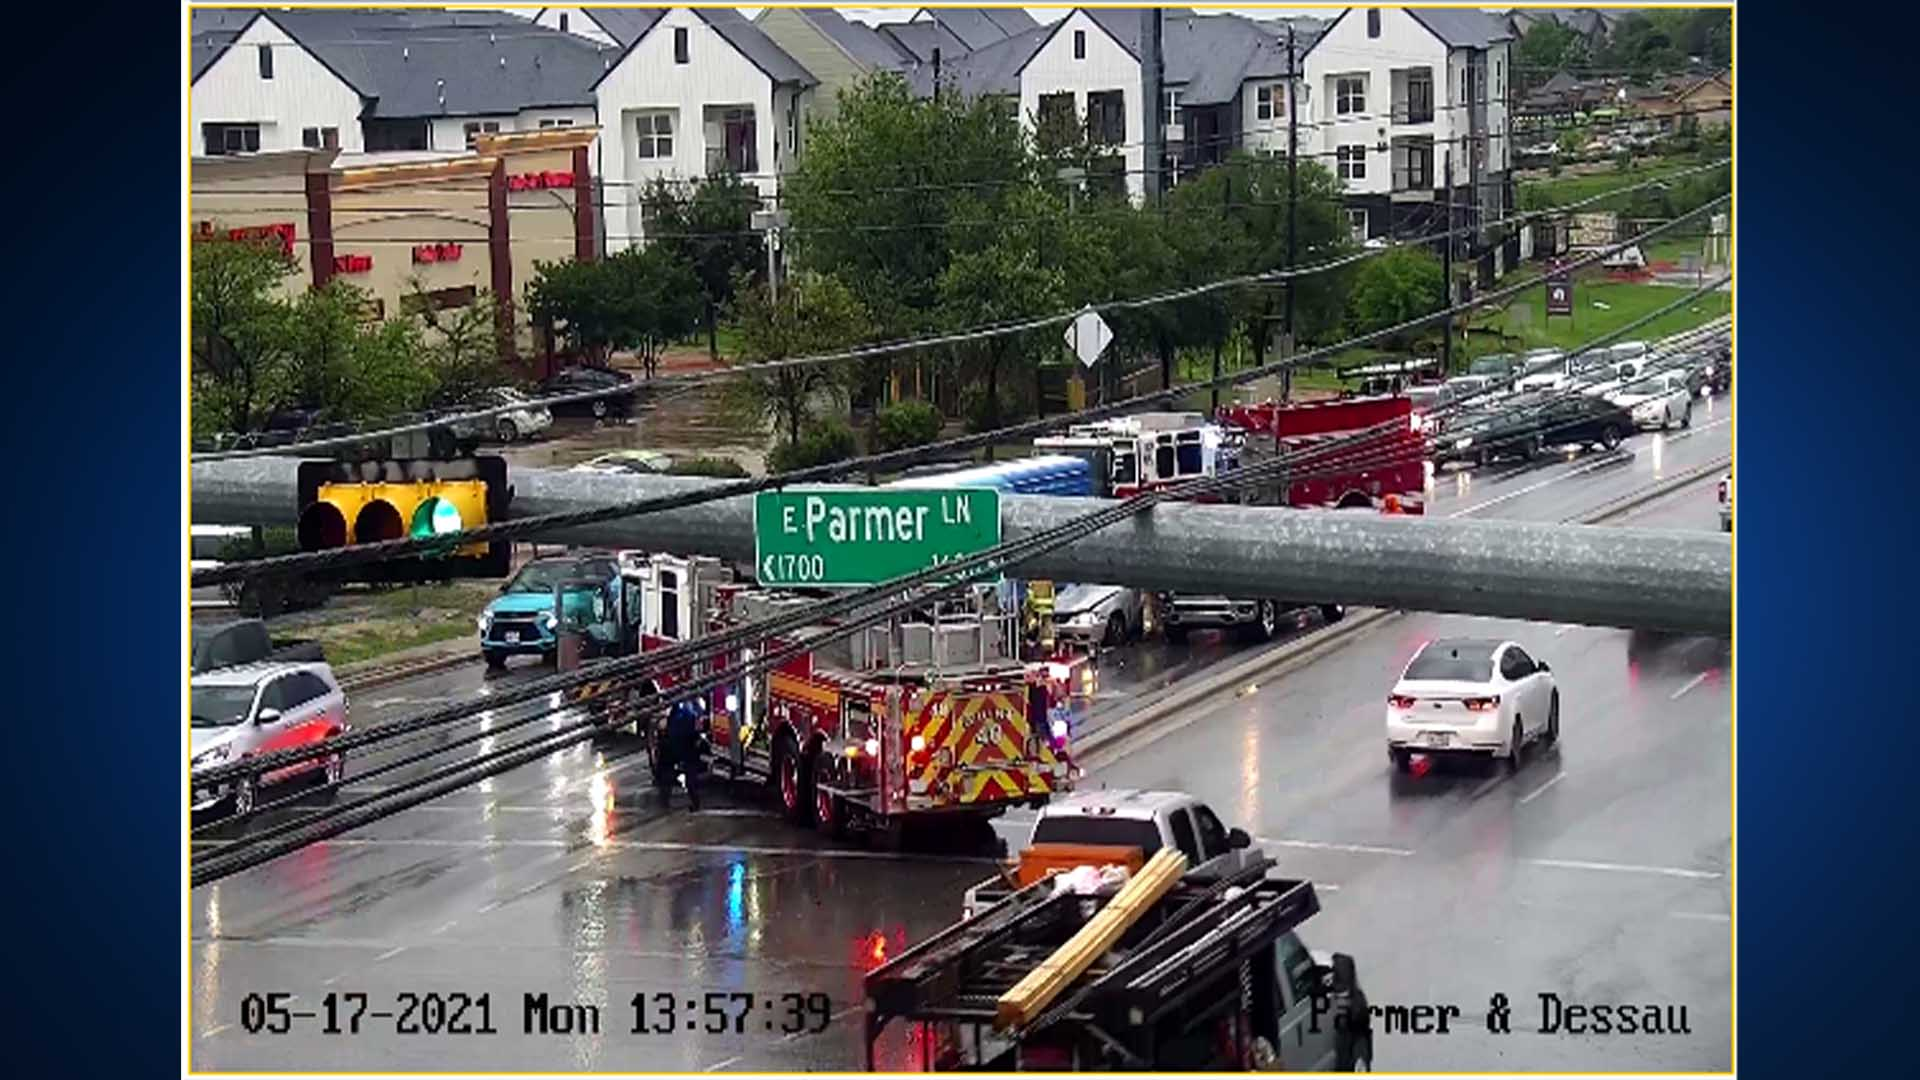 Crash at Dessau Road and East Parmer Lane blocks multiple lanes on May 17, 2021 (Photo: ATX Transportation via Twitter)